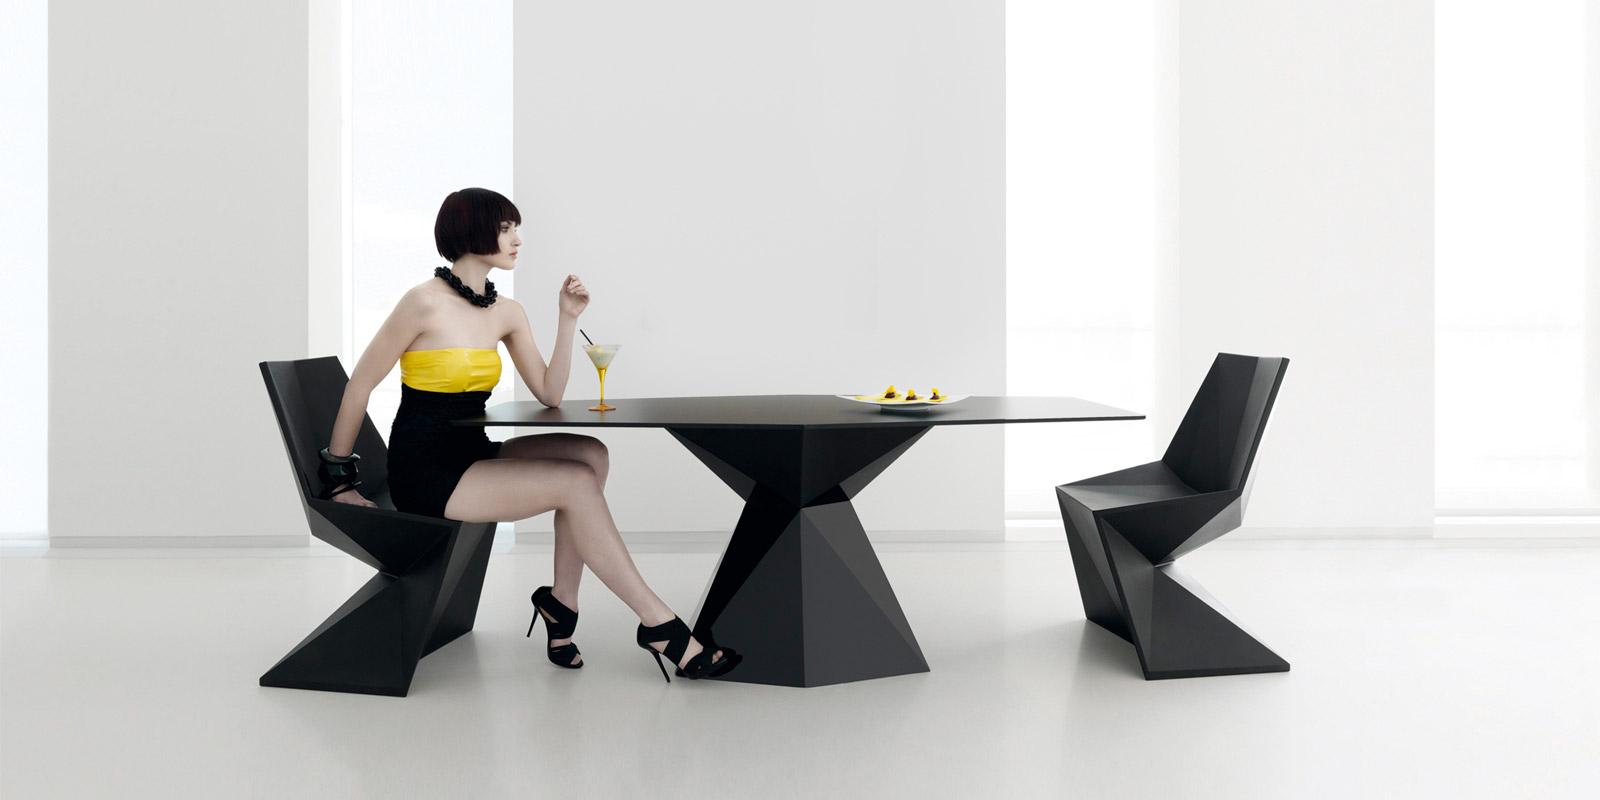 Vetex_Dining_Table_Chairs_Black_Vondom.jpg